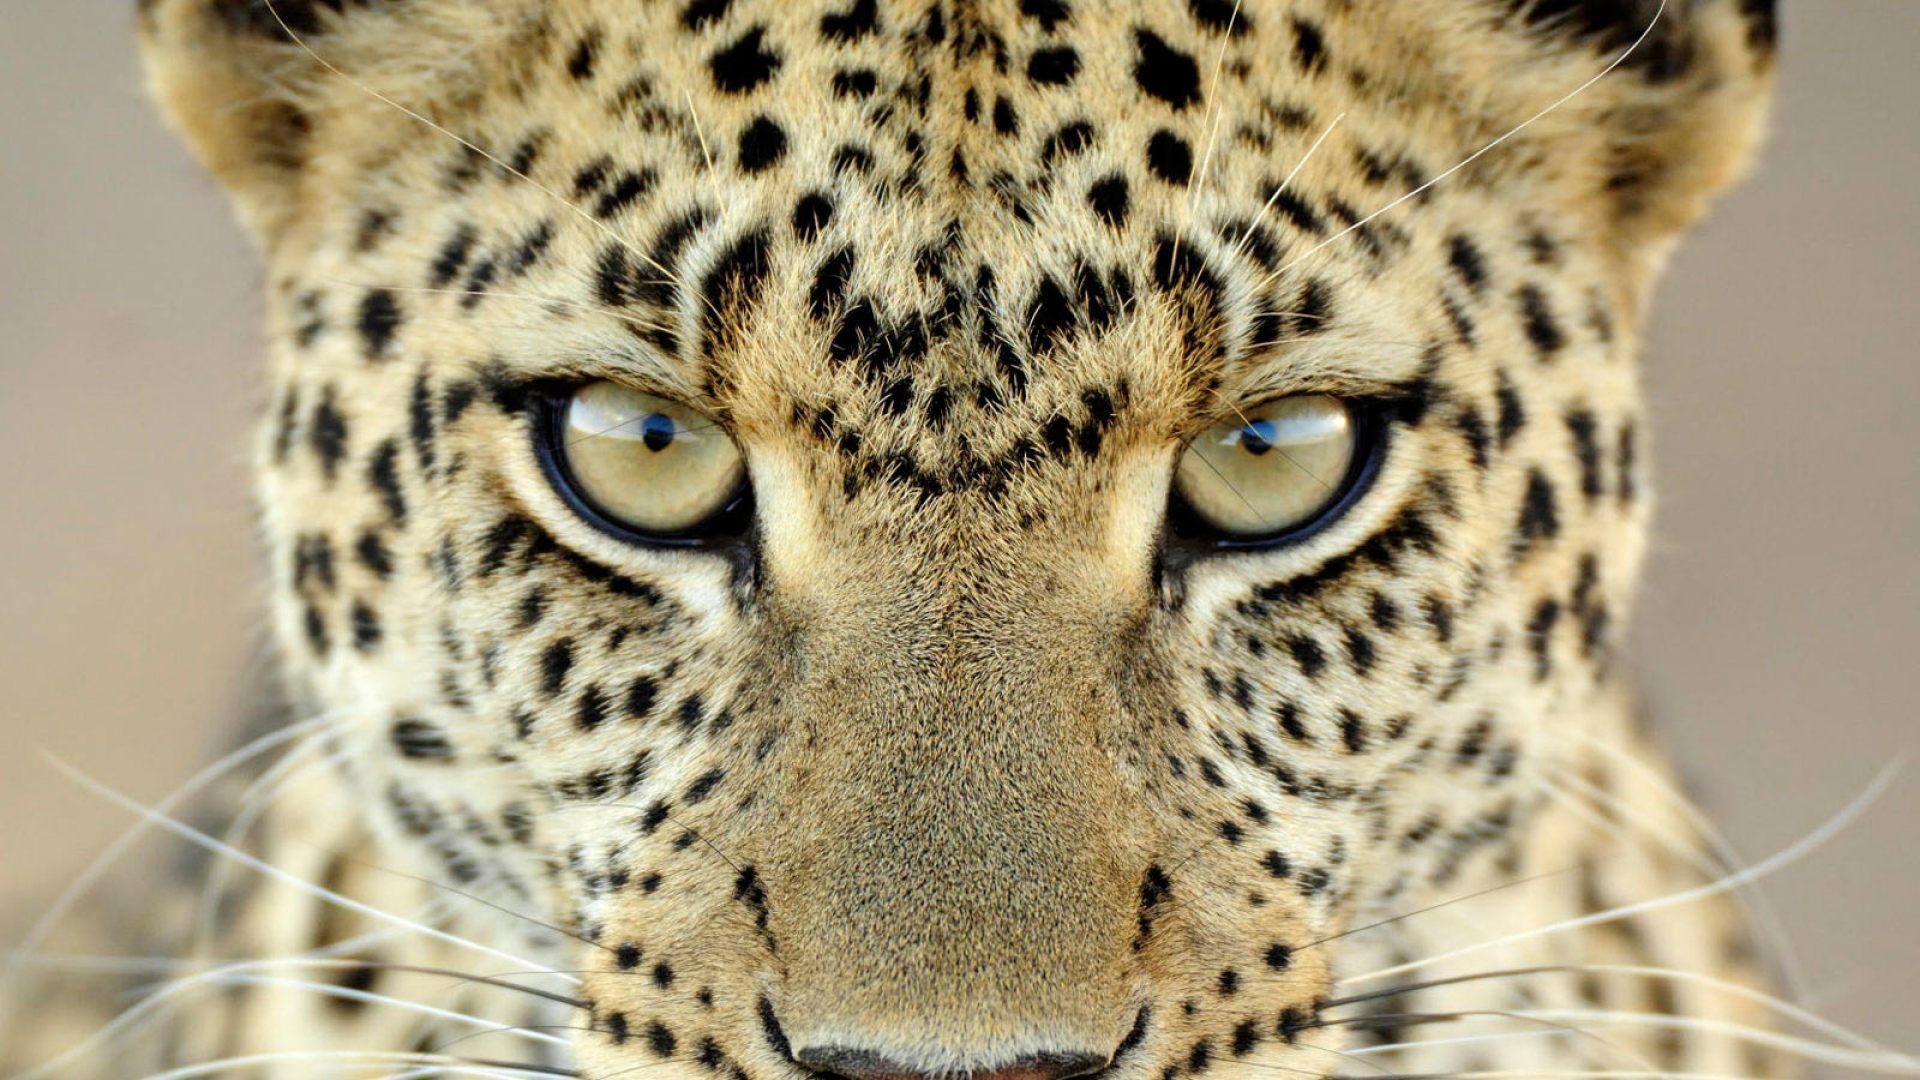 Fondos Animados Para Celular De Animales: Fondos De Pantalla Animales Salvajes, Wallpapers Hd